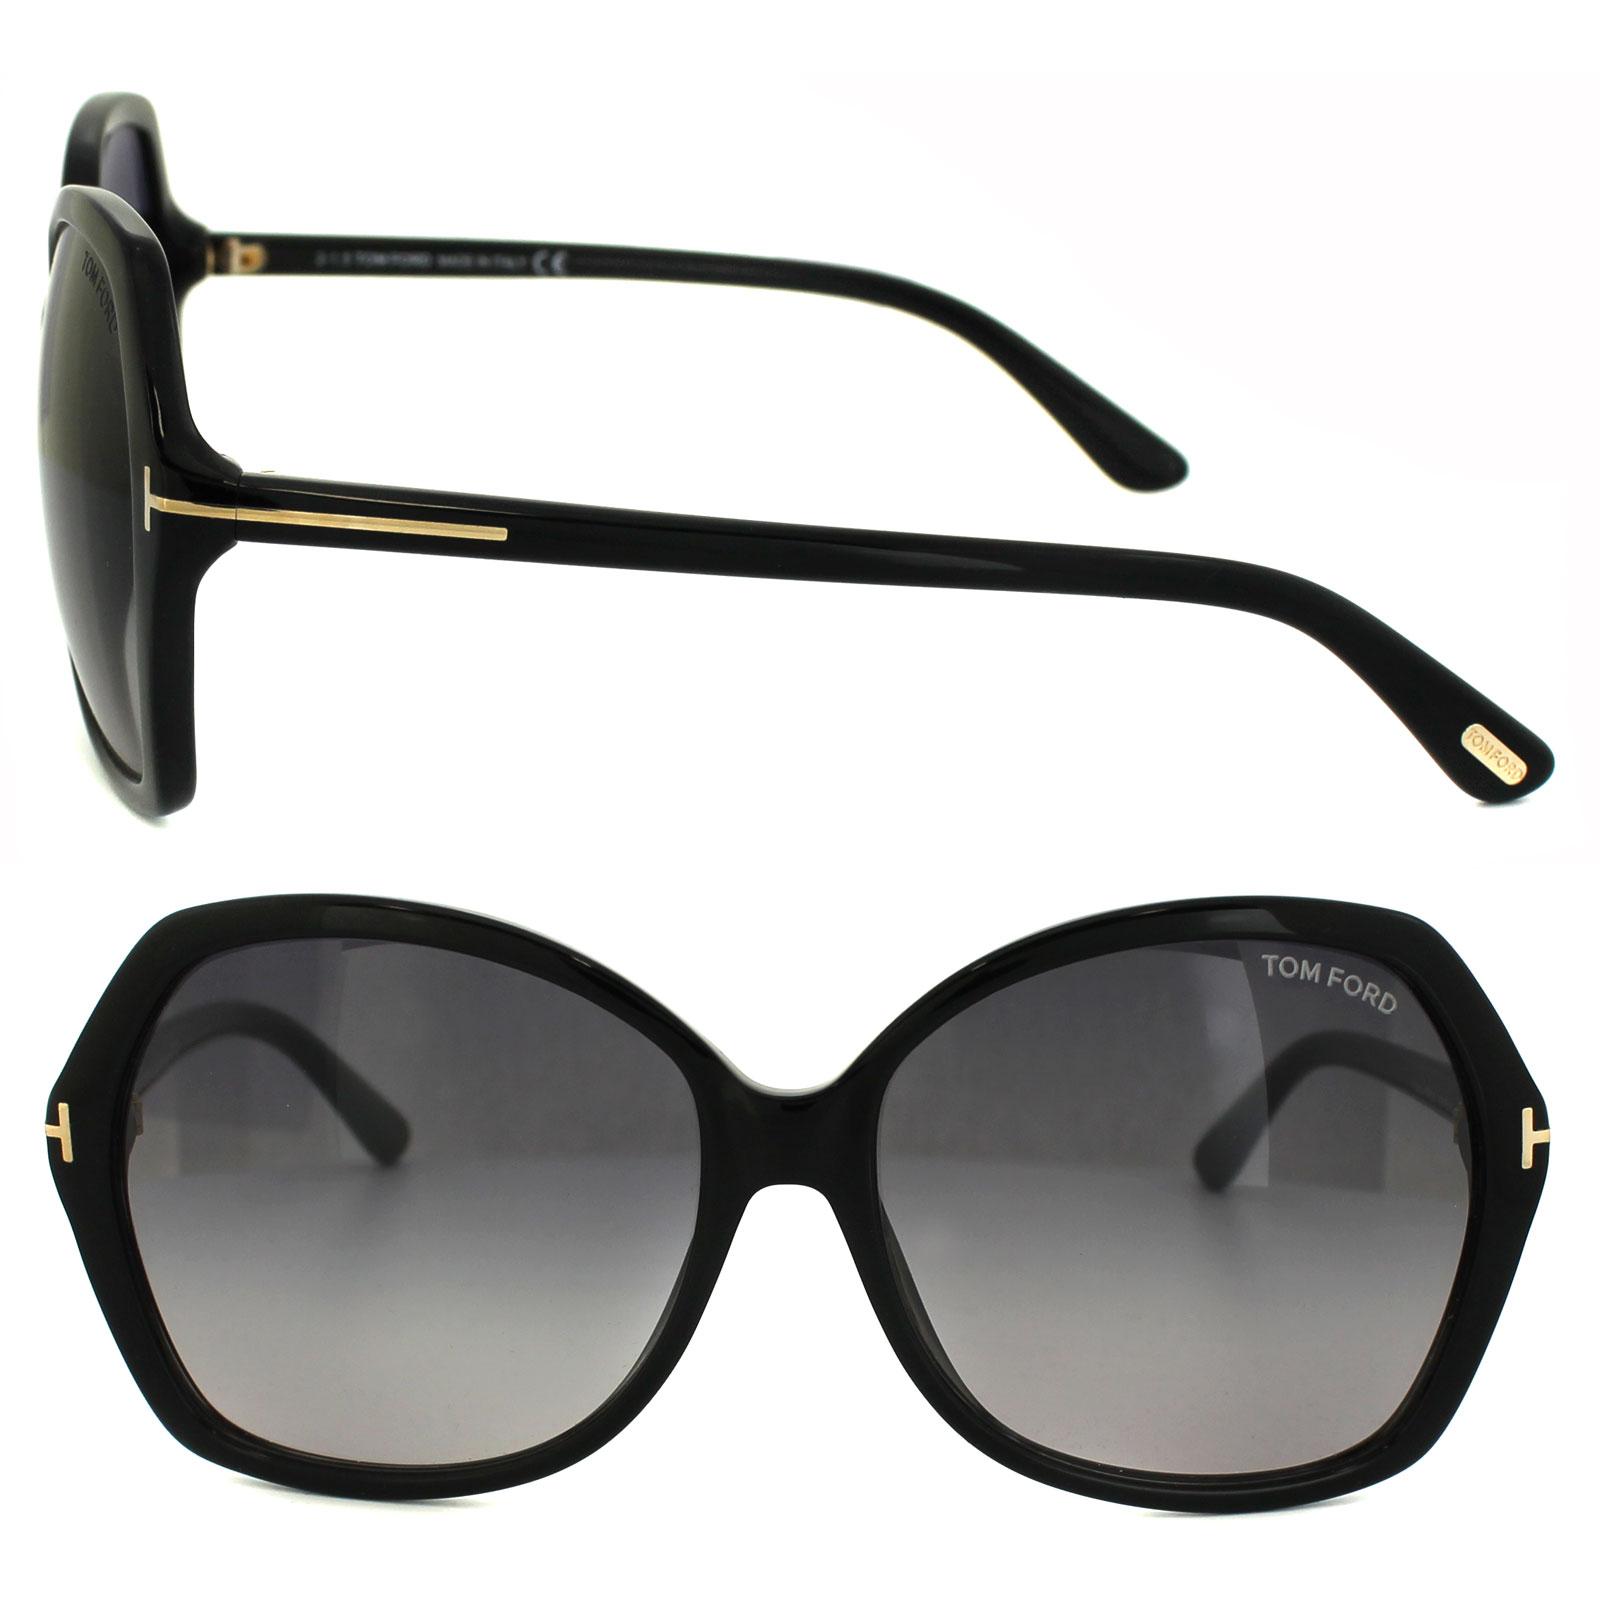 Cheap Tom Ford 0328 Carola Sunglasses Discounted Sunglasses